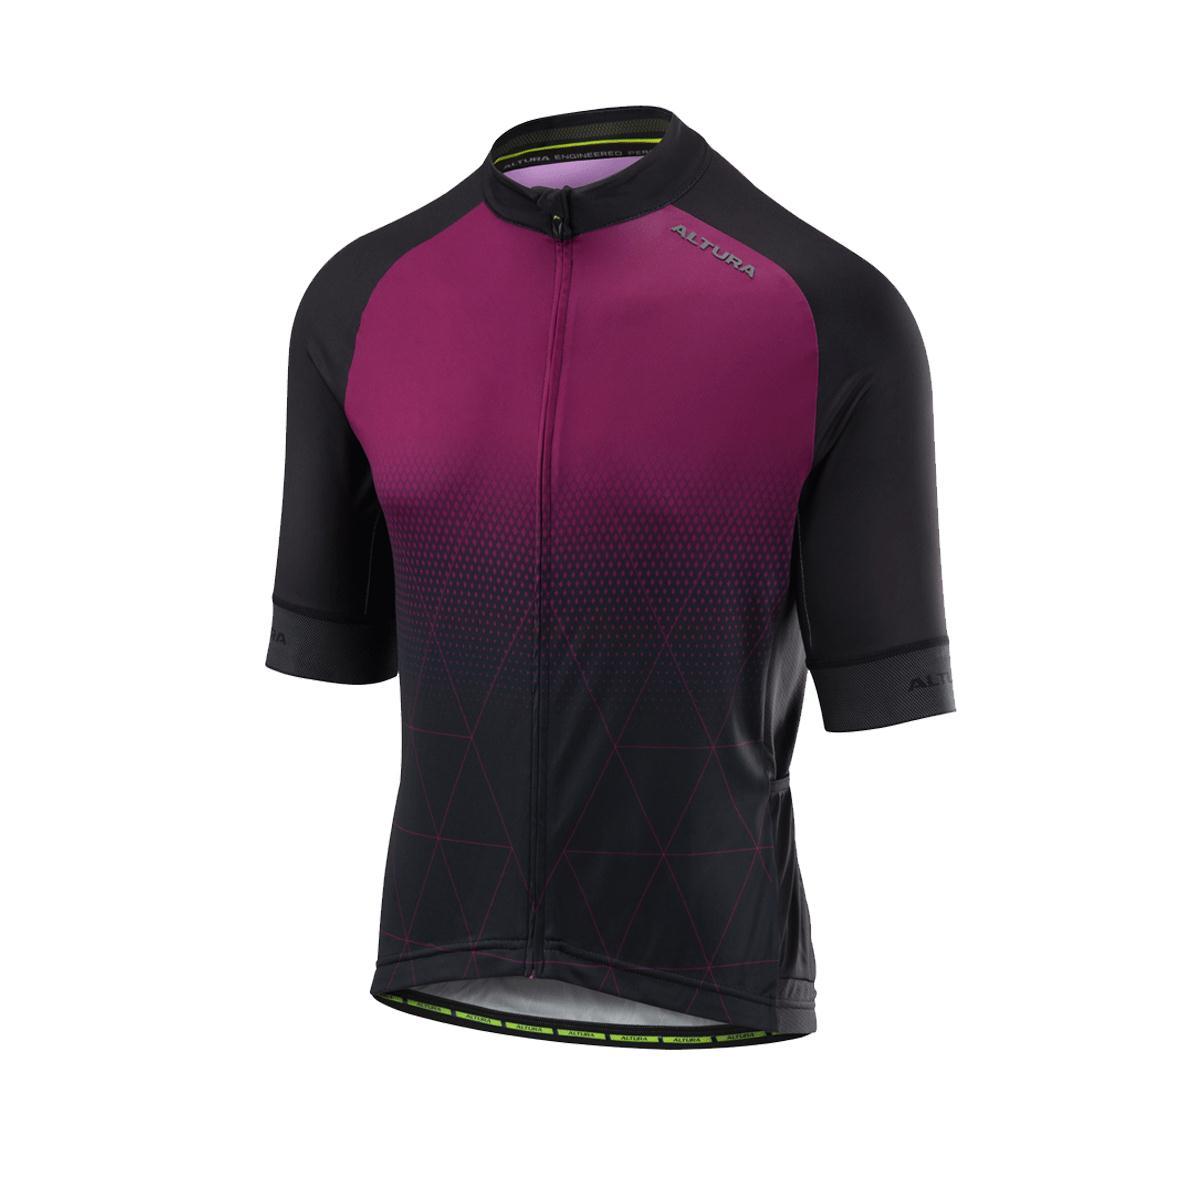 Altura Peloton Short Sleeve Mens Jersey in Prism Plum Black £49.99 3362e47f7